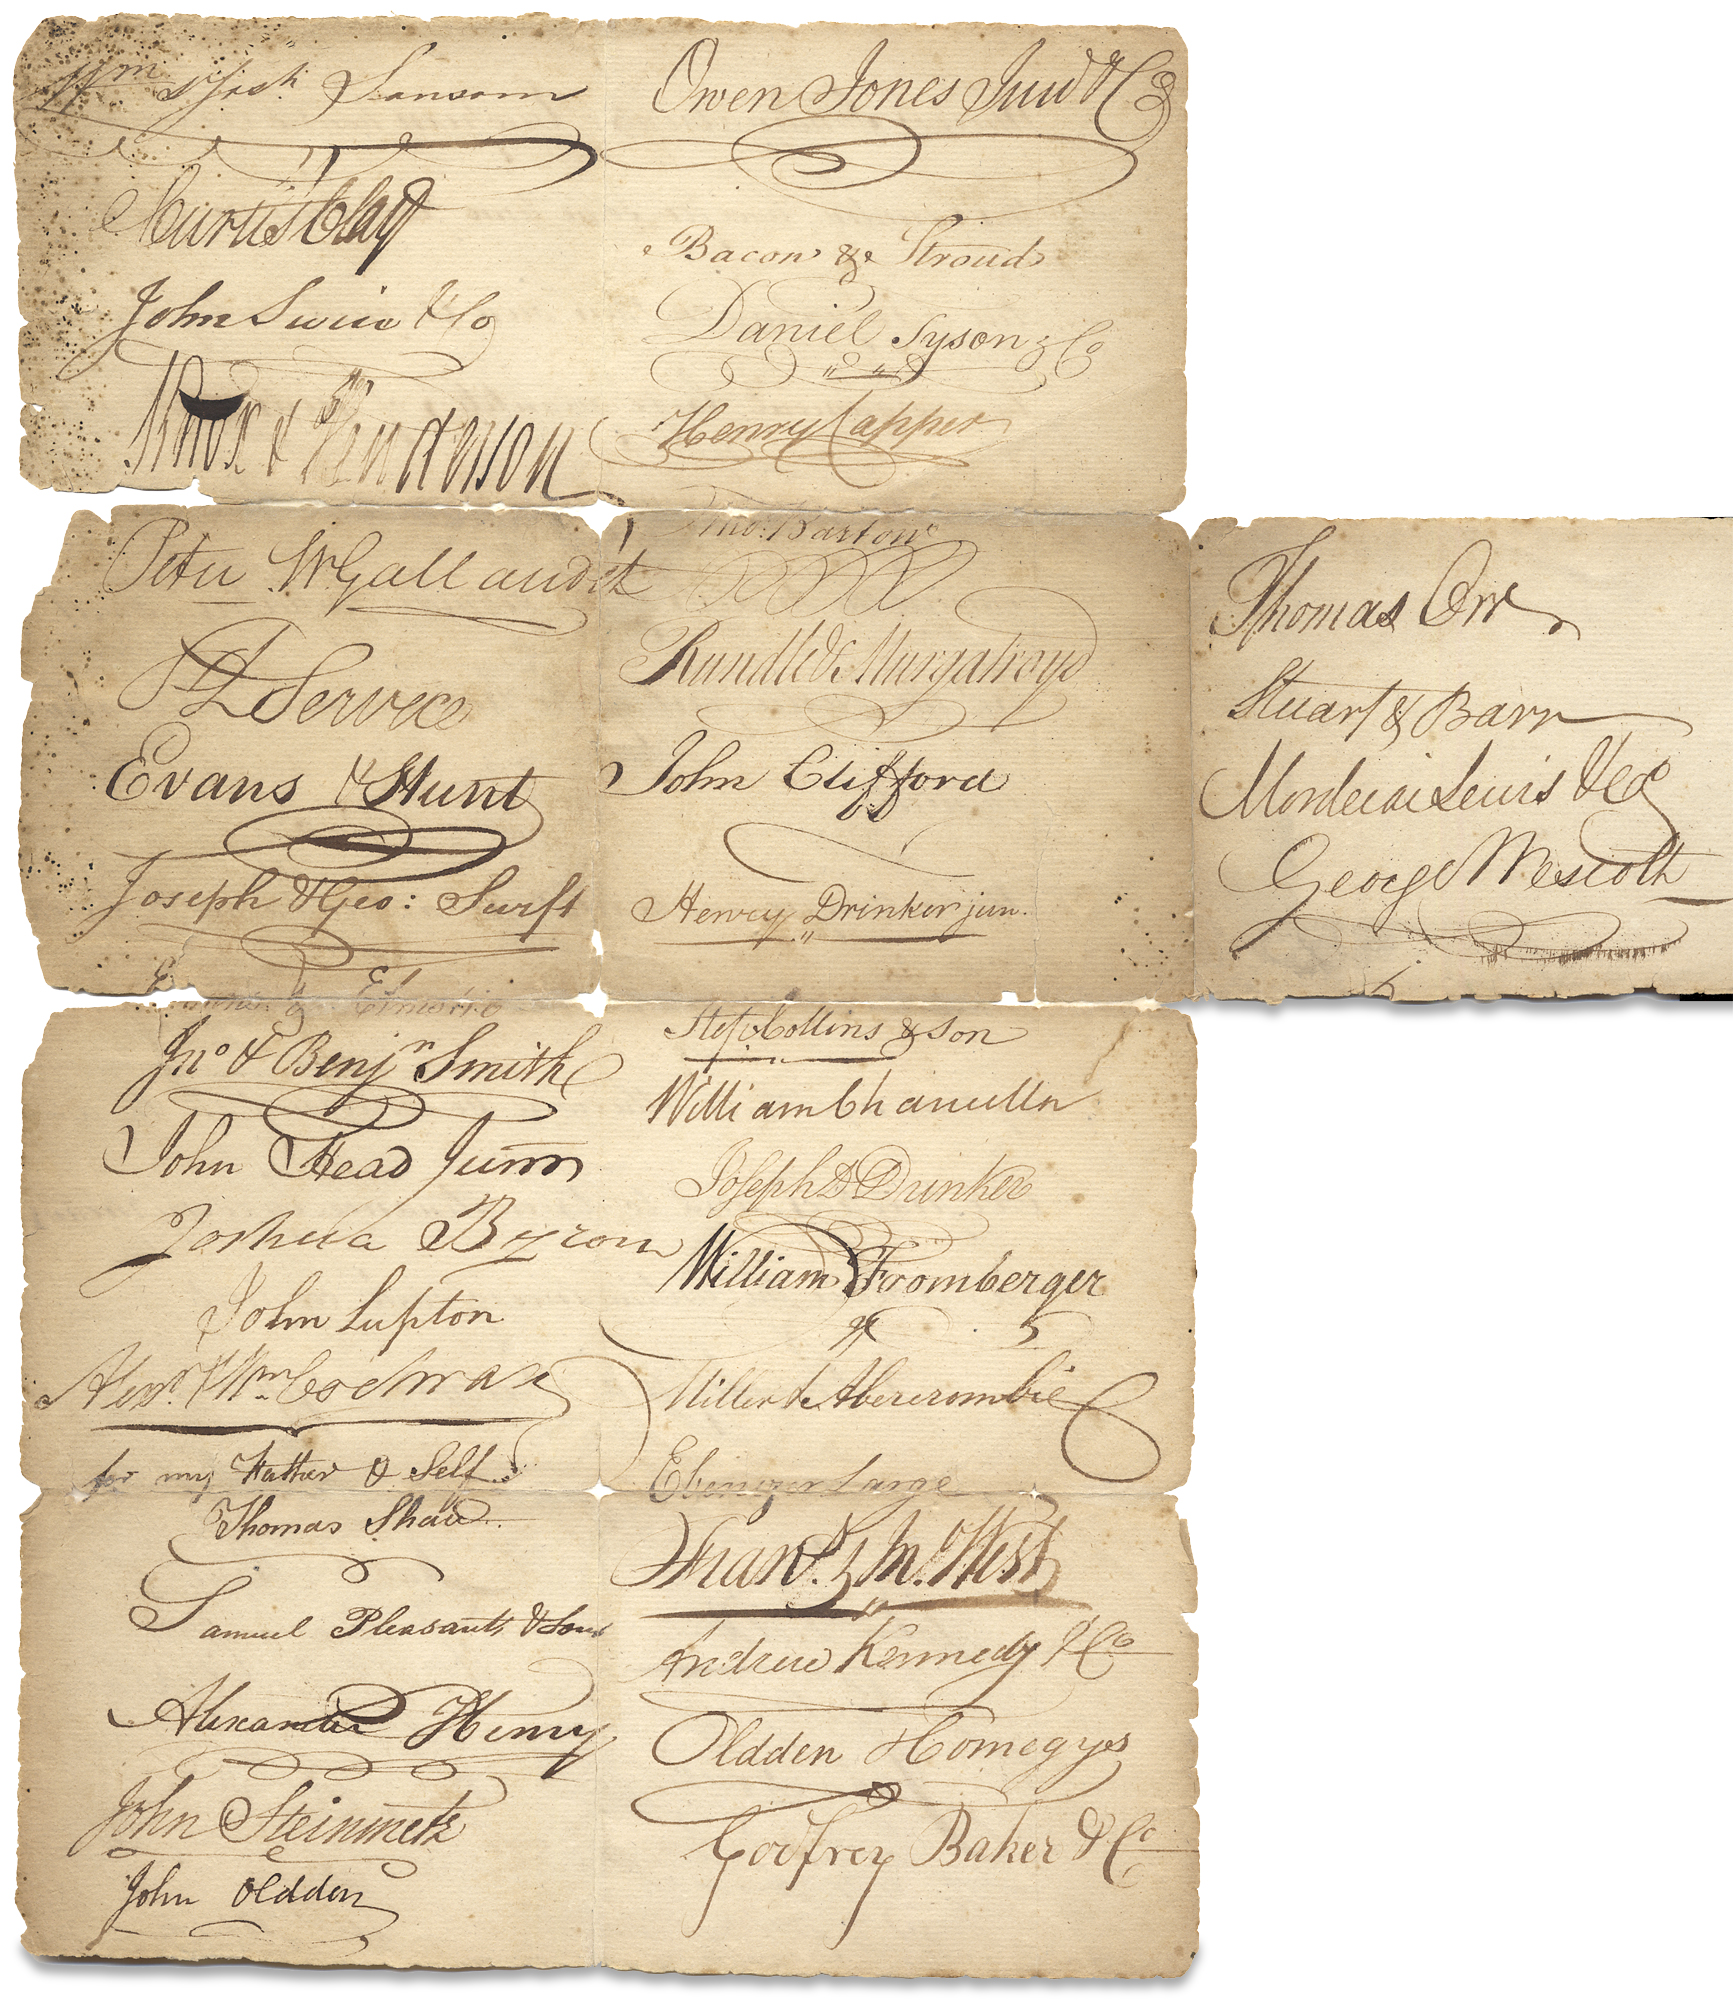 1790 Philadelphia Merchants' and Importers'